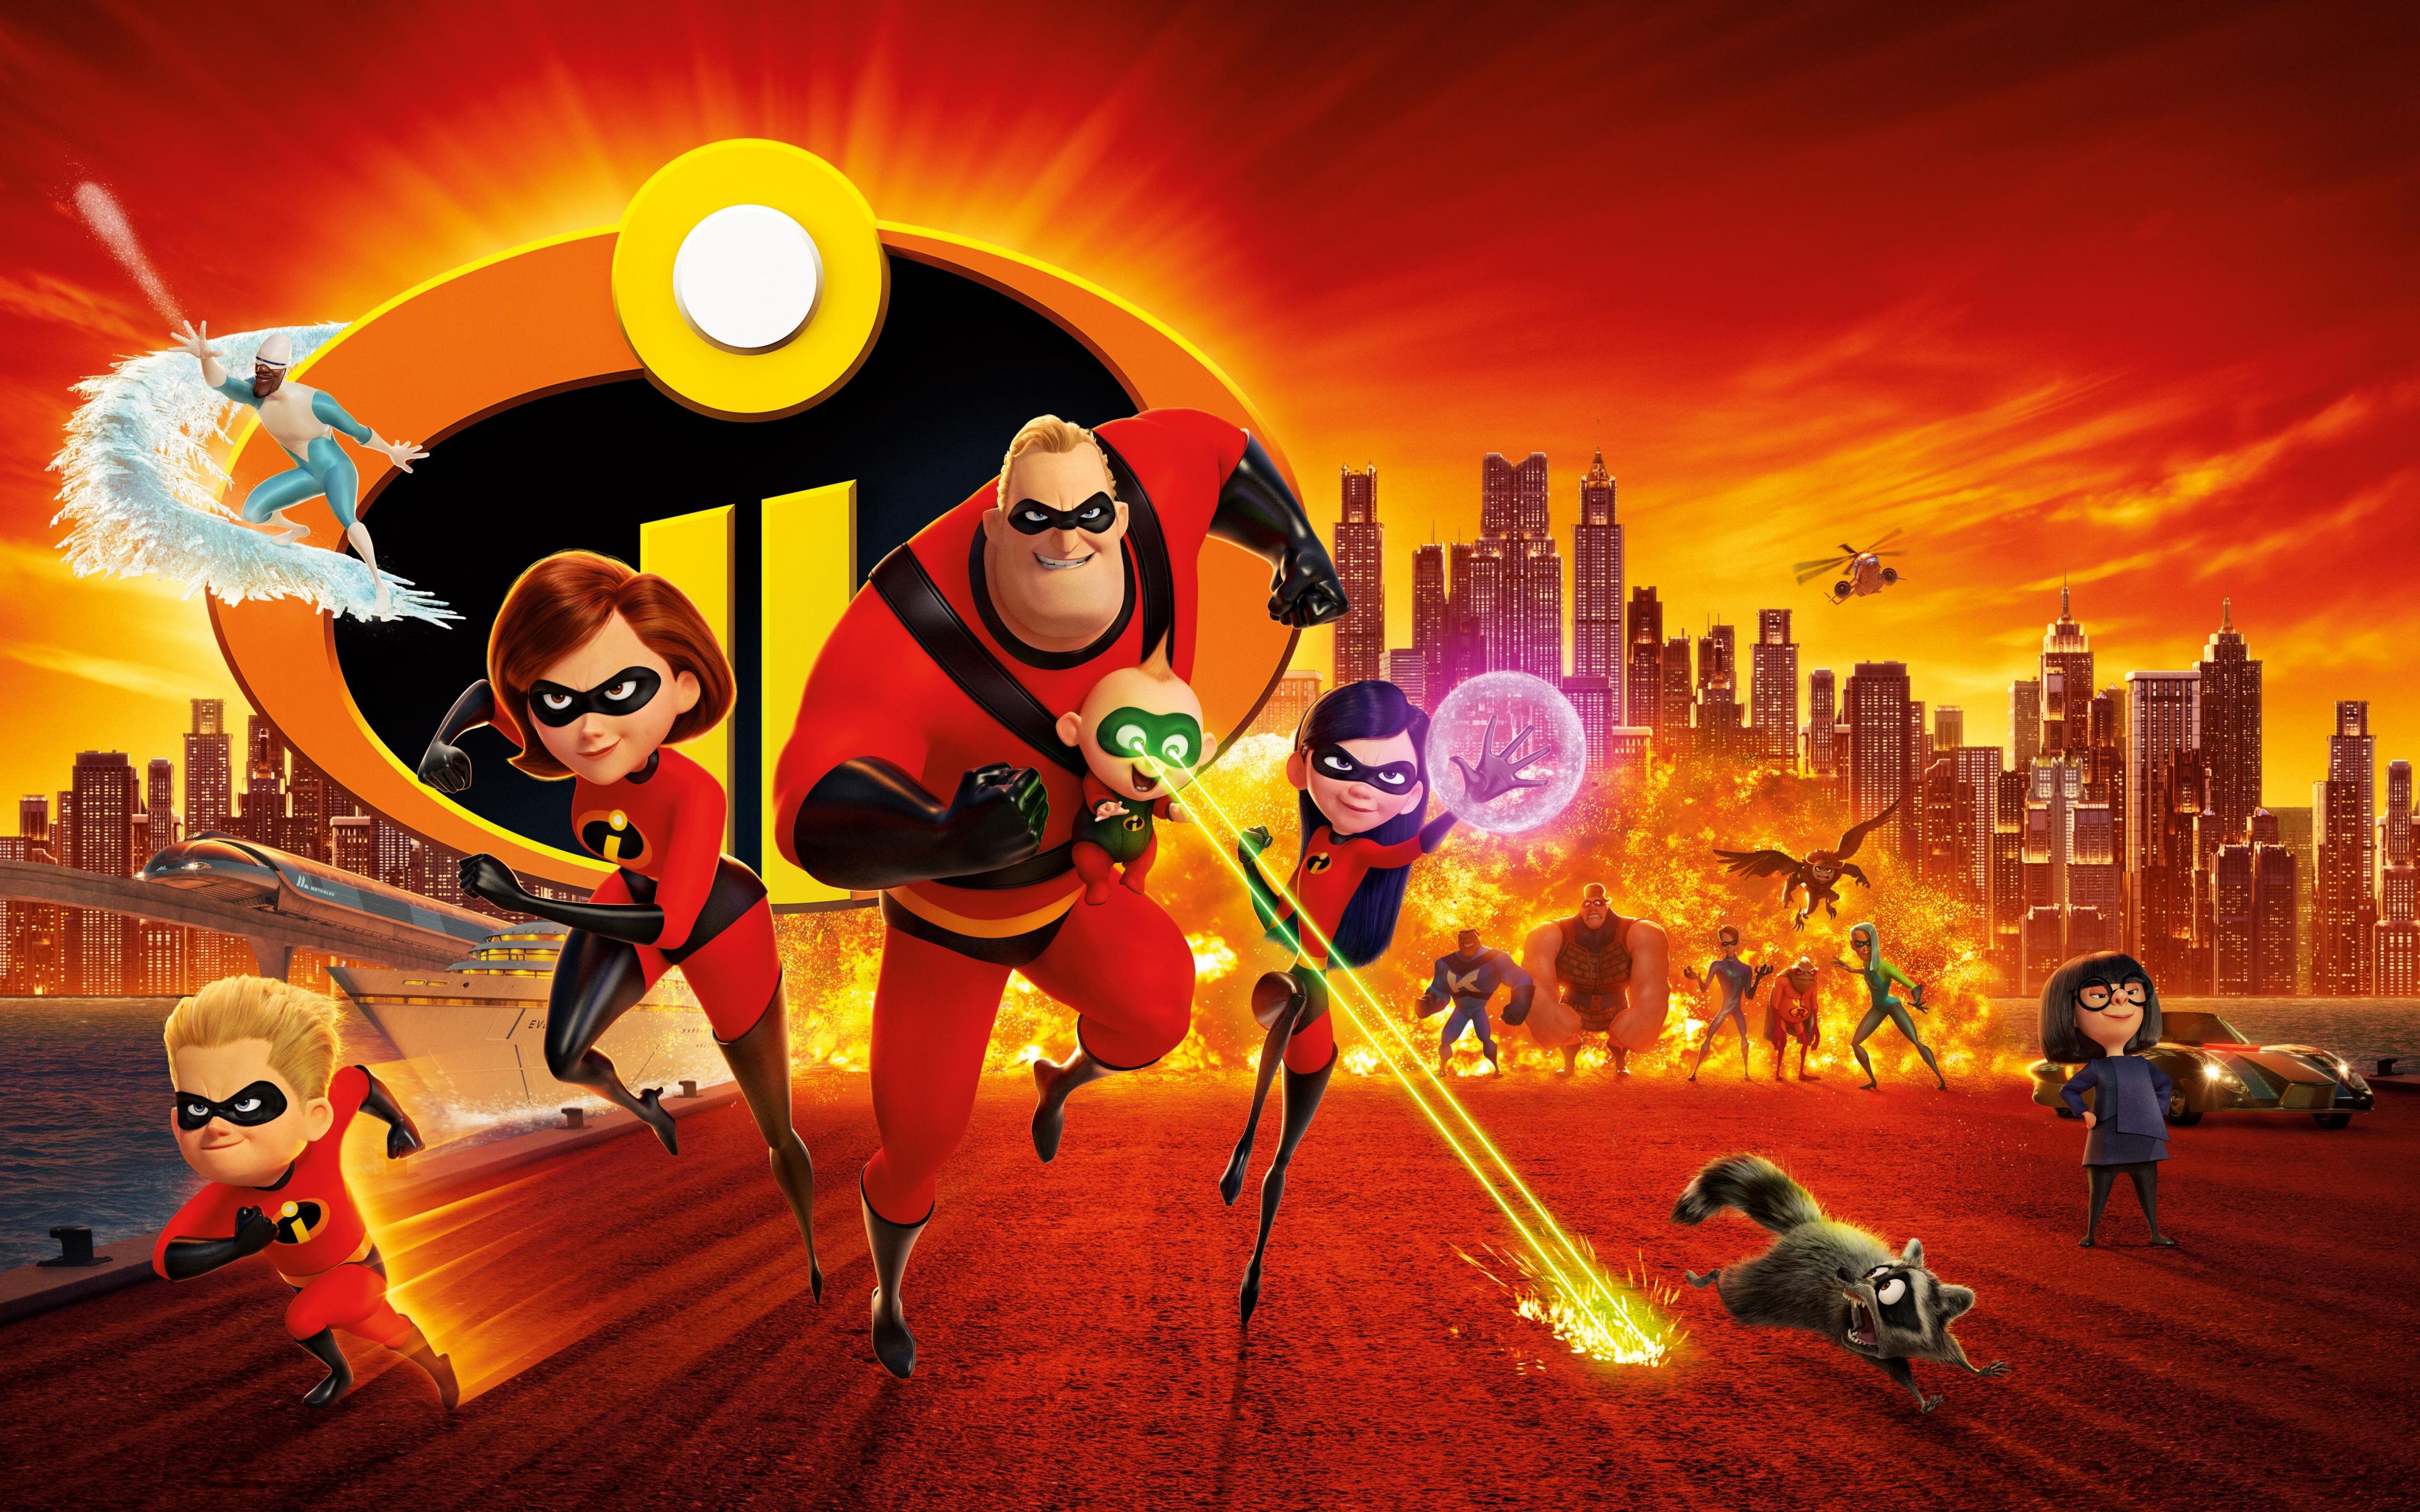 download 3840x2400 wallpaper 2018, animation movie, superheroes